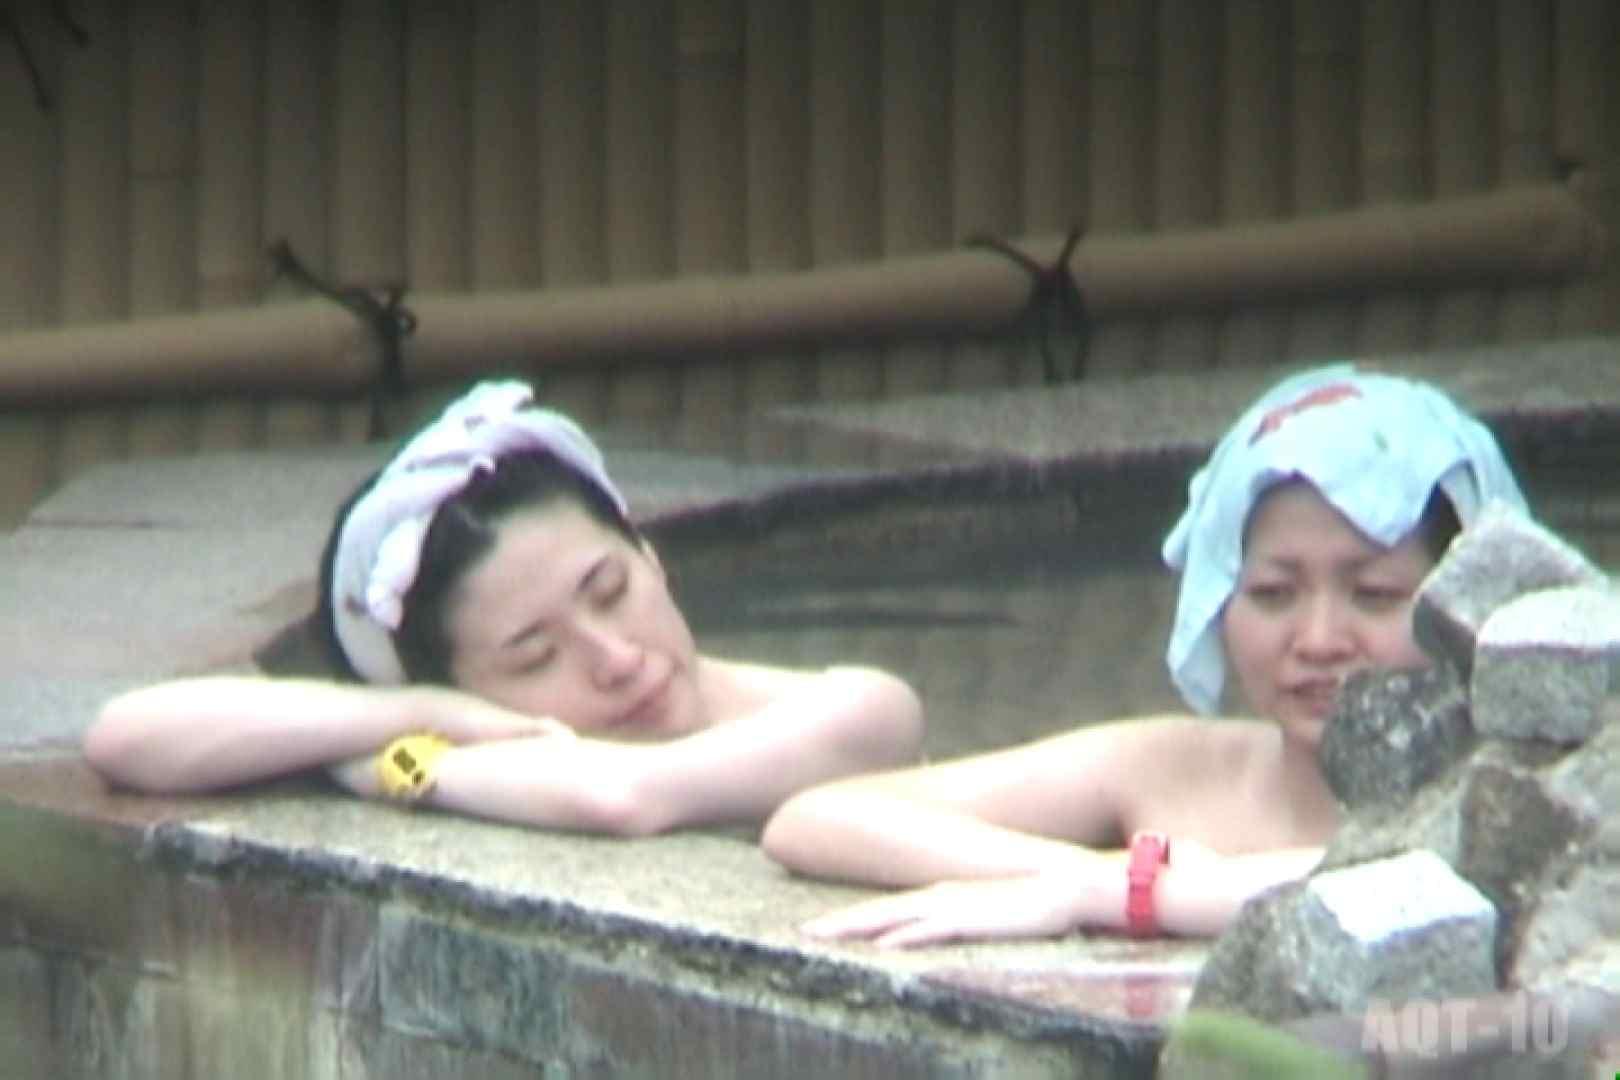 Aquaな露天風呂Vol.793 盗撮映像  72Pix 31